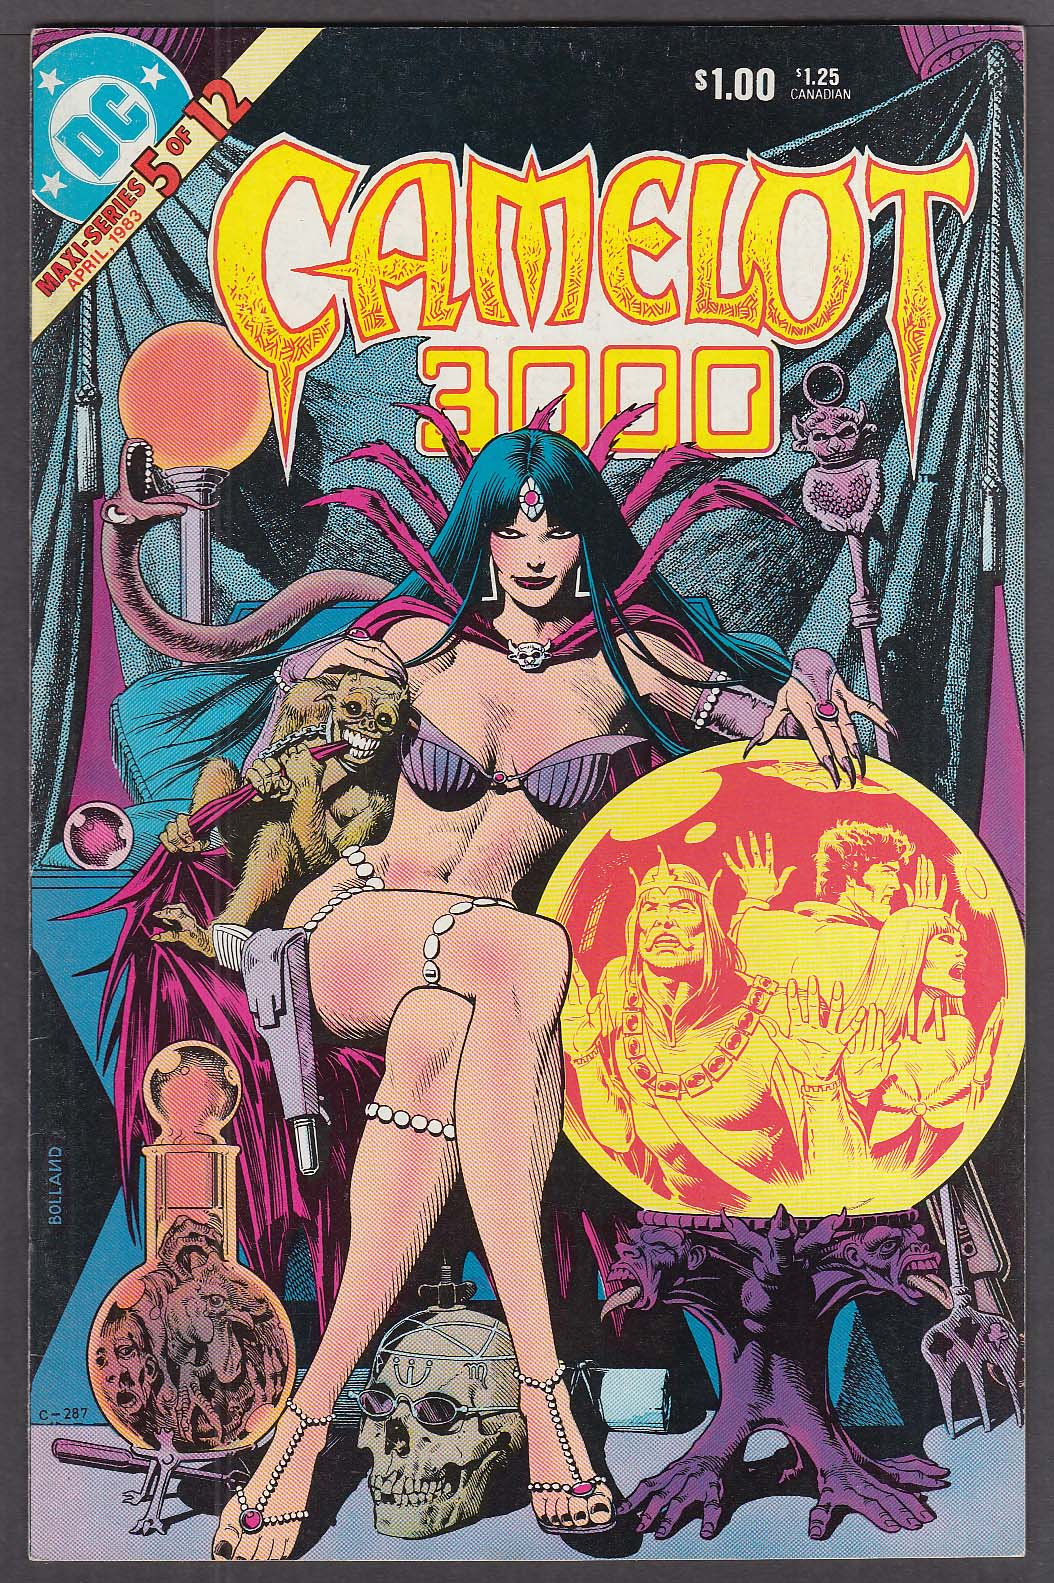 CAMELOT 3000 #5 DC comic book 4/1983